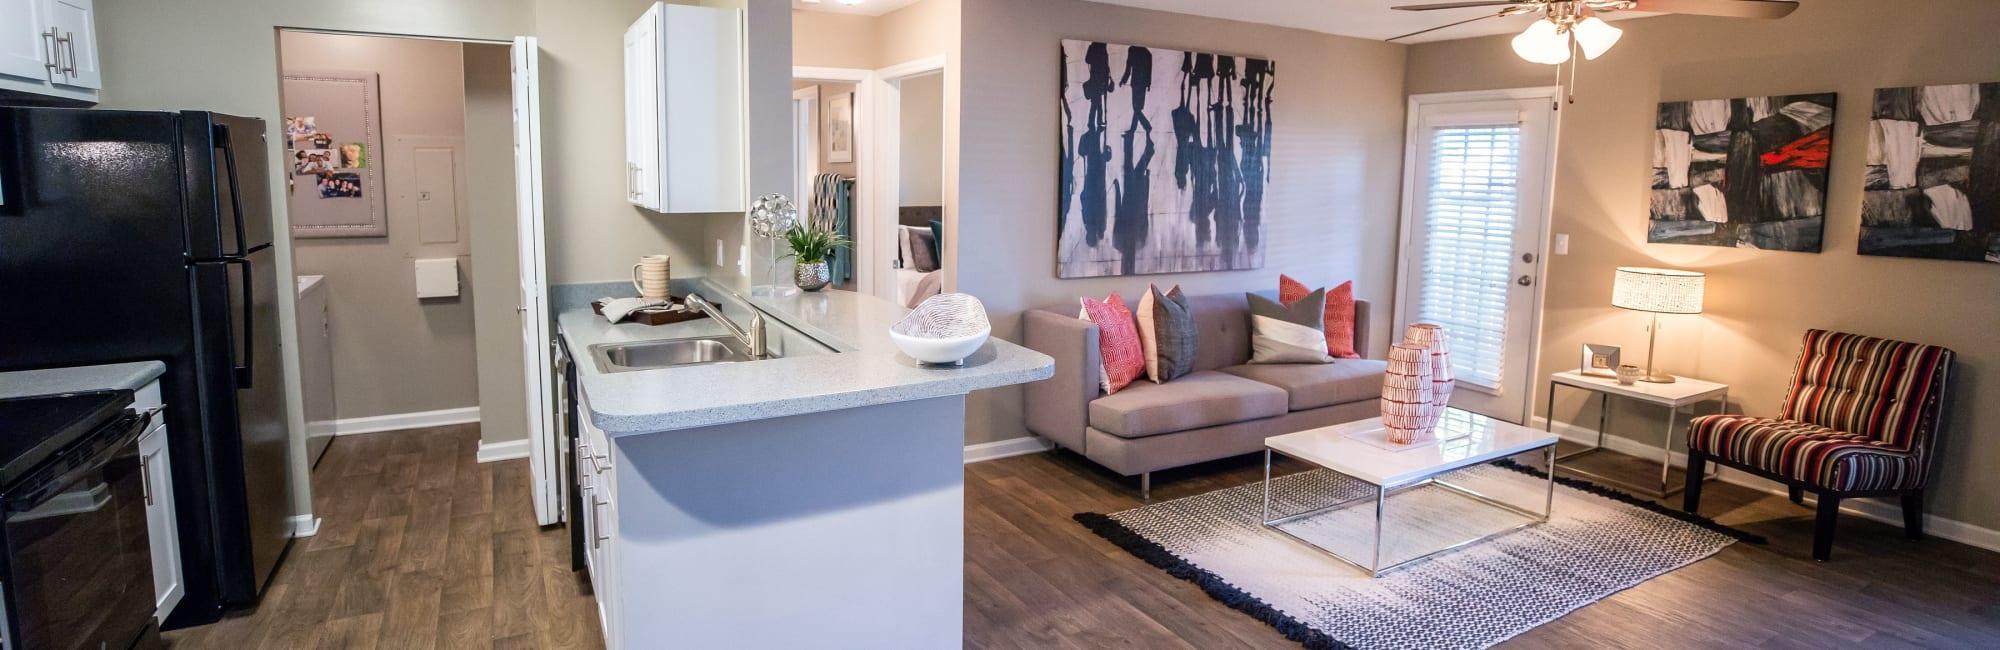 Apartments at 200 Braehill in Winston-Salem, North Carolina